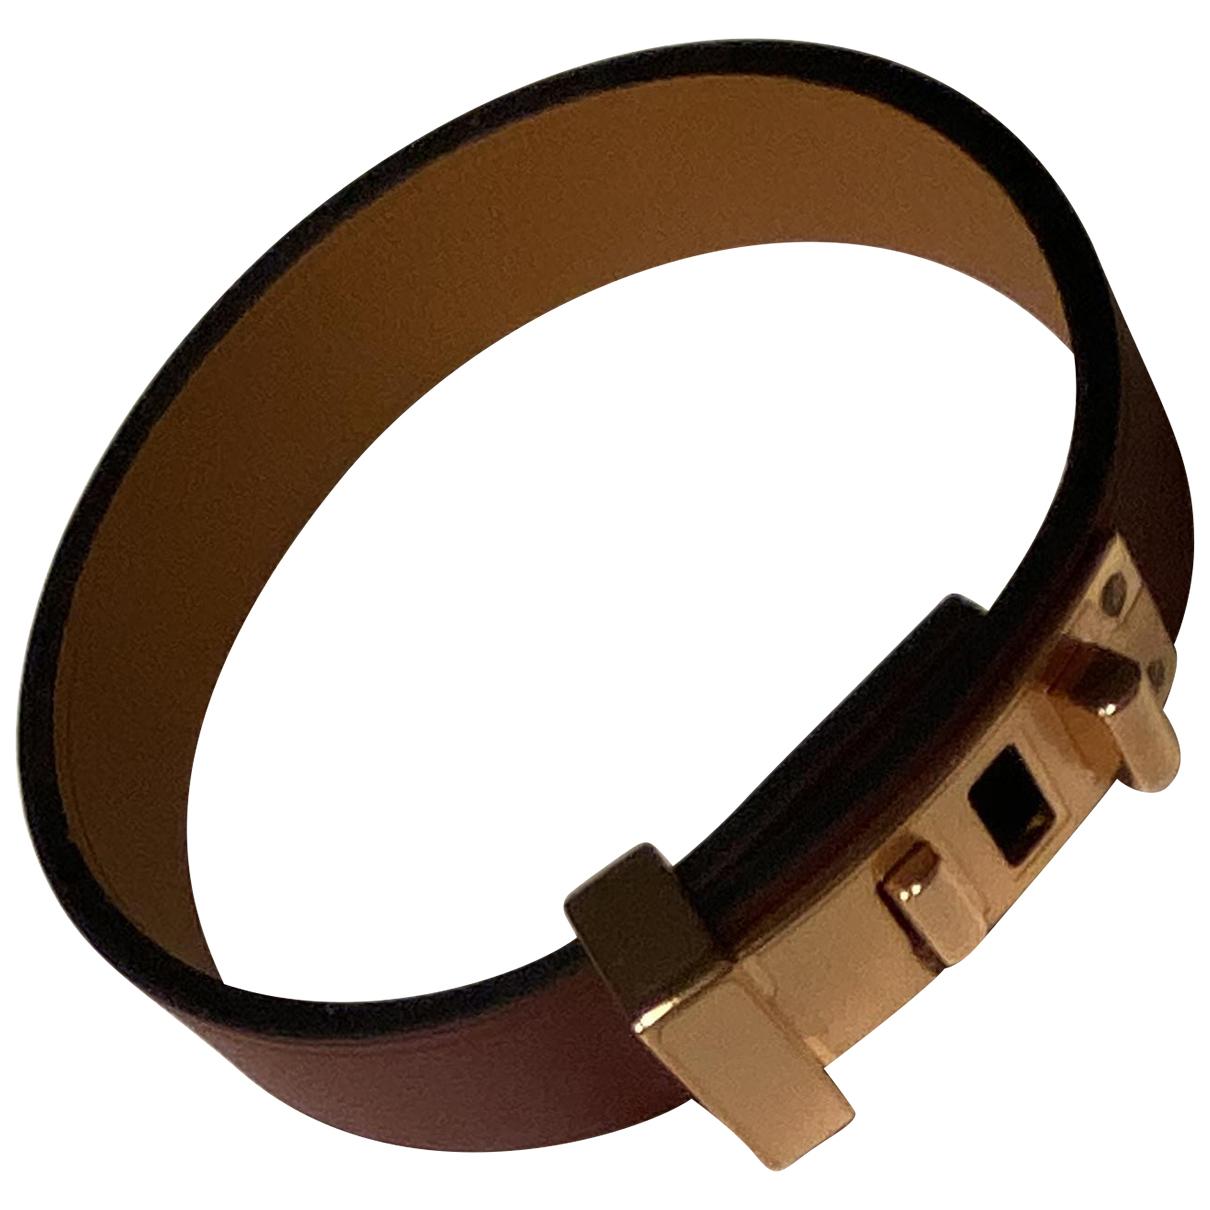 Hermès N Burgundy Leather bracelet for Women N